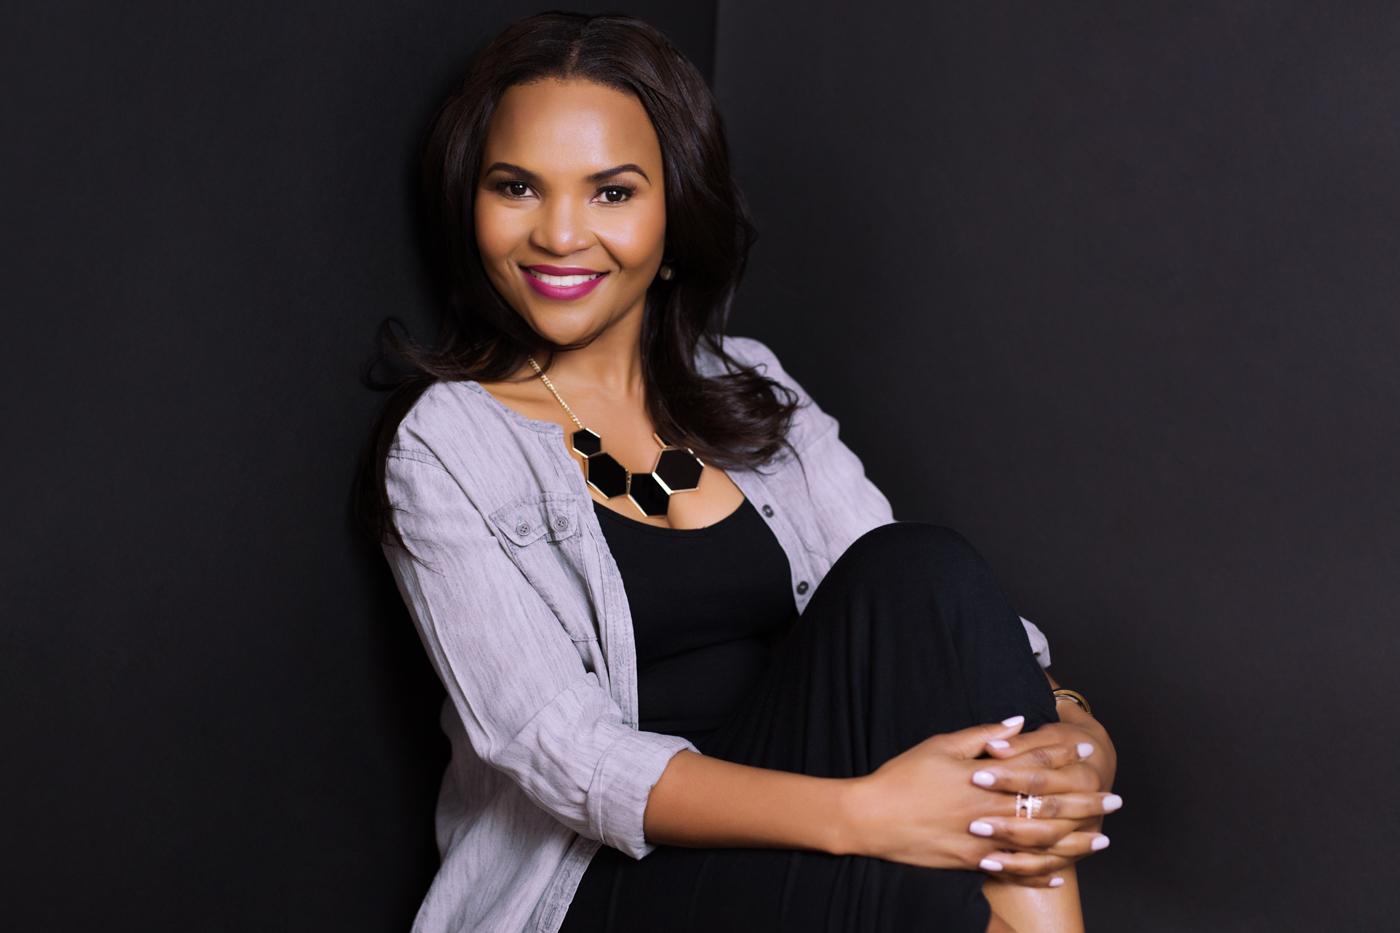 branding-photo-shoot-with-kay-zulu-ksenia-pro-photography-10